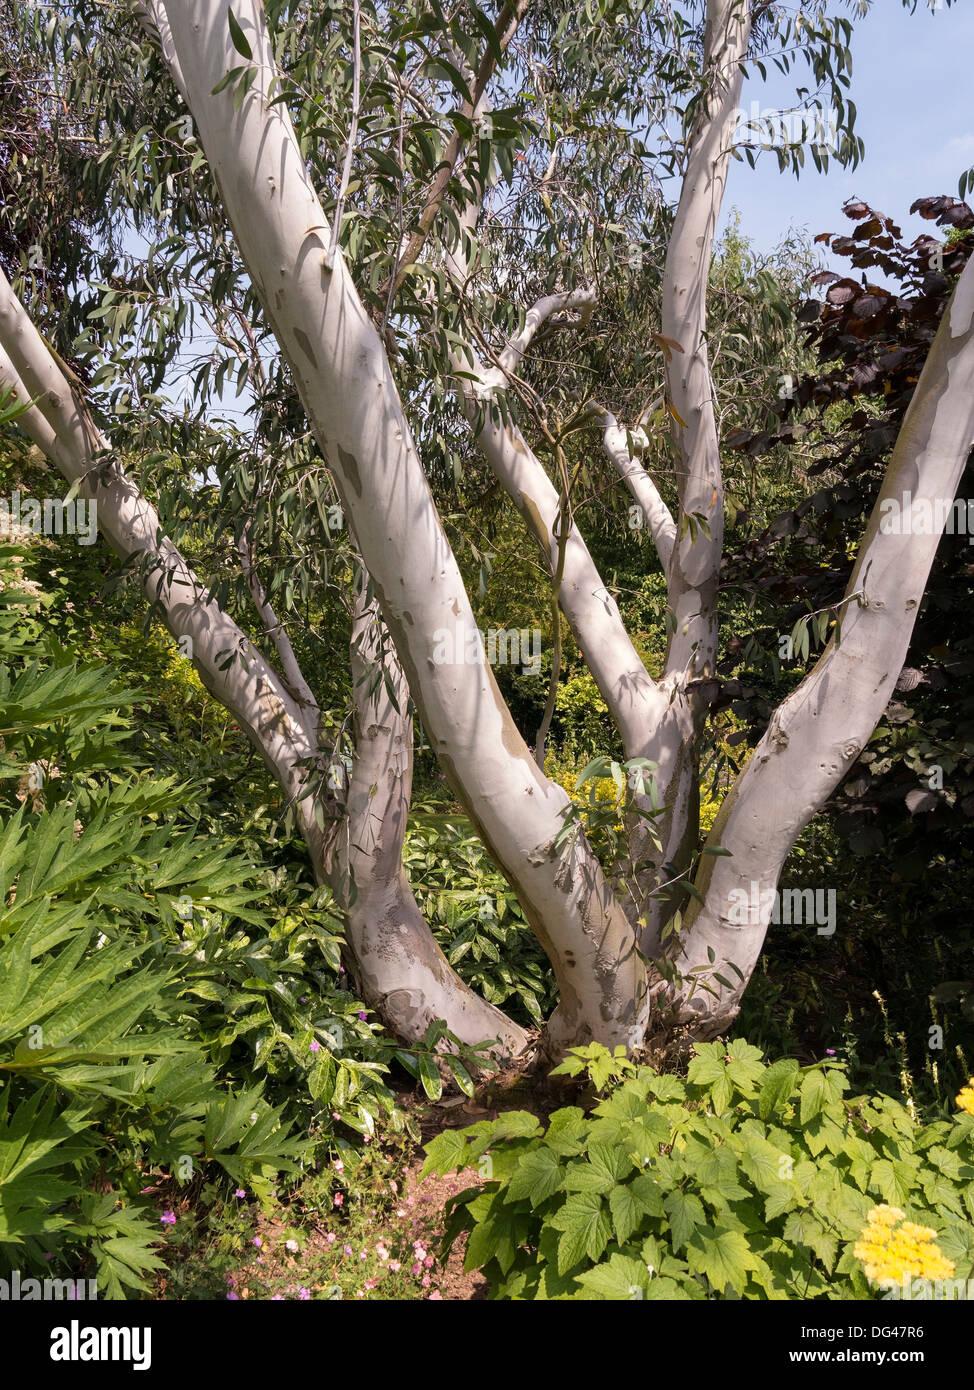 White bark and trunks of Eucalyptus Paciflora Niphophila tree growing in Barnsdale Gardens, Rutland, England, UK - Stock Image